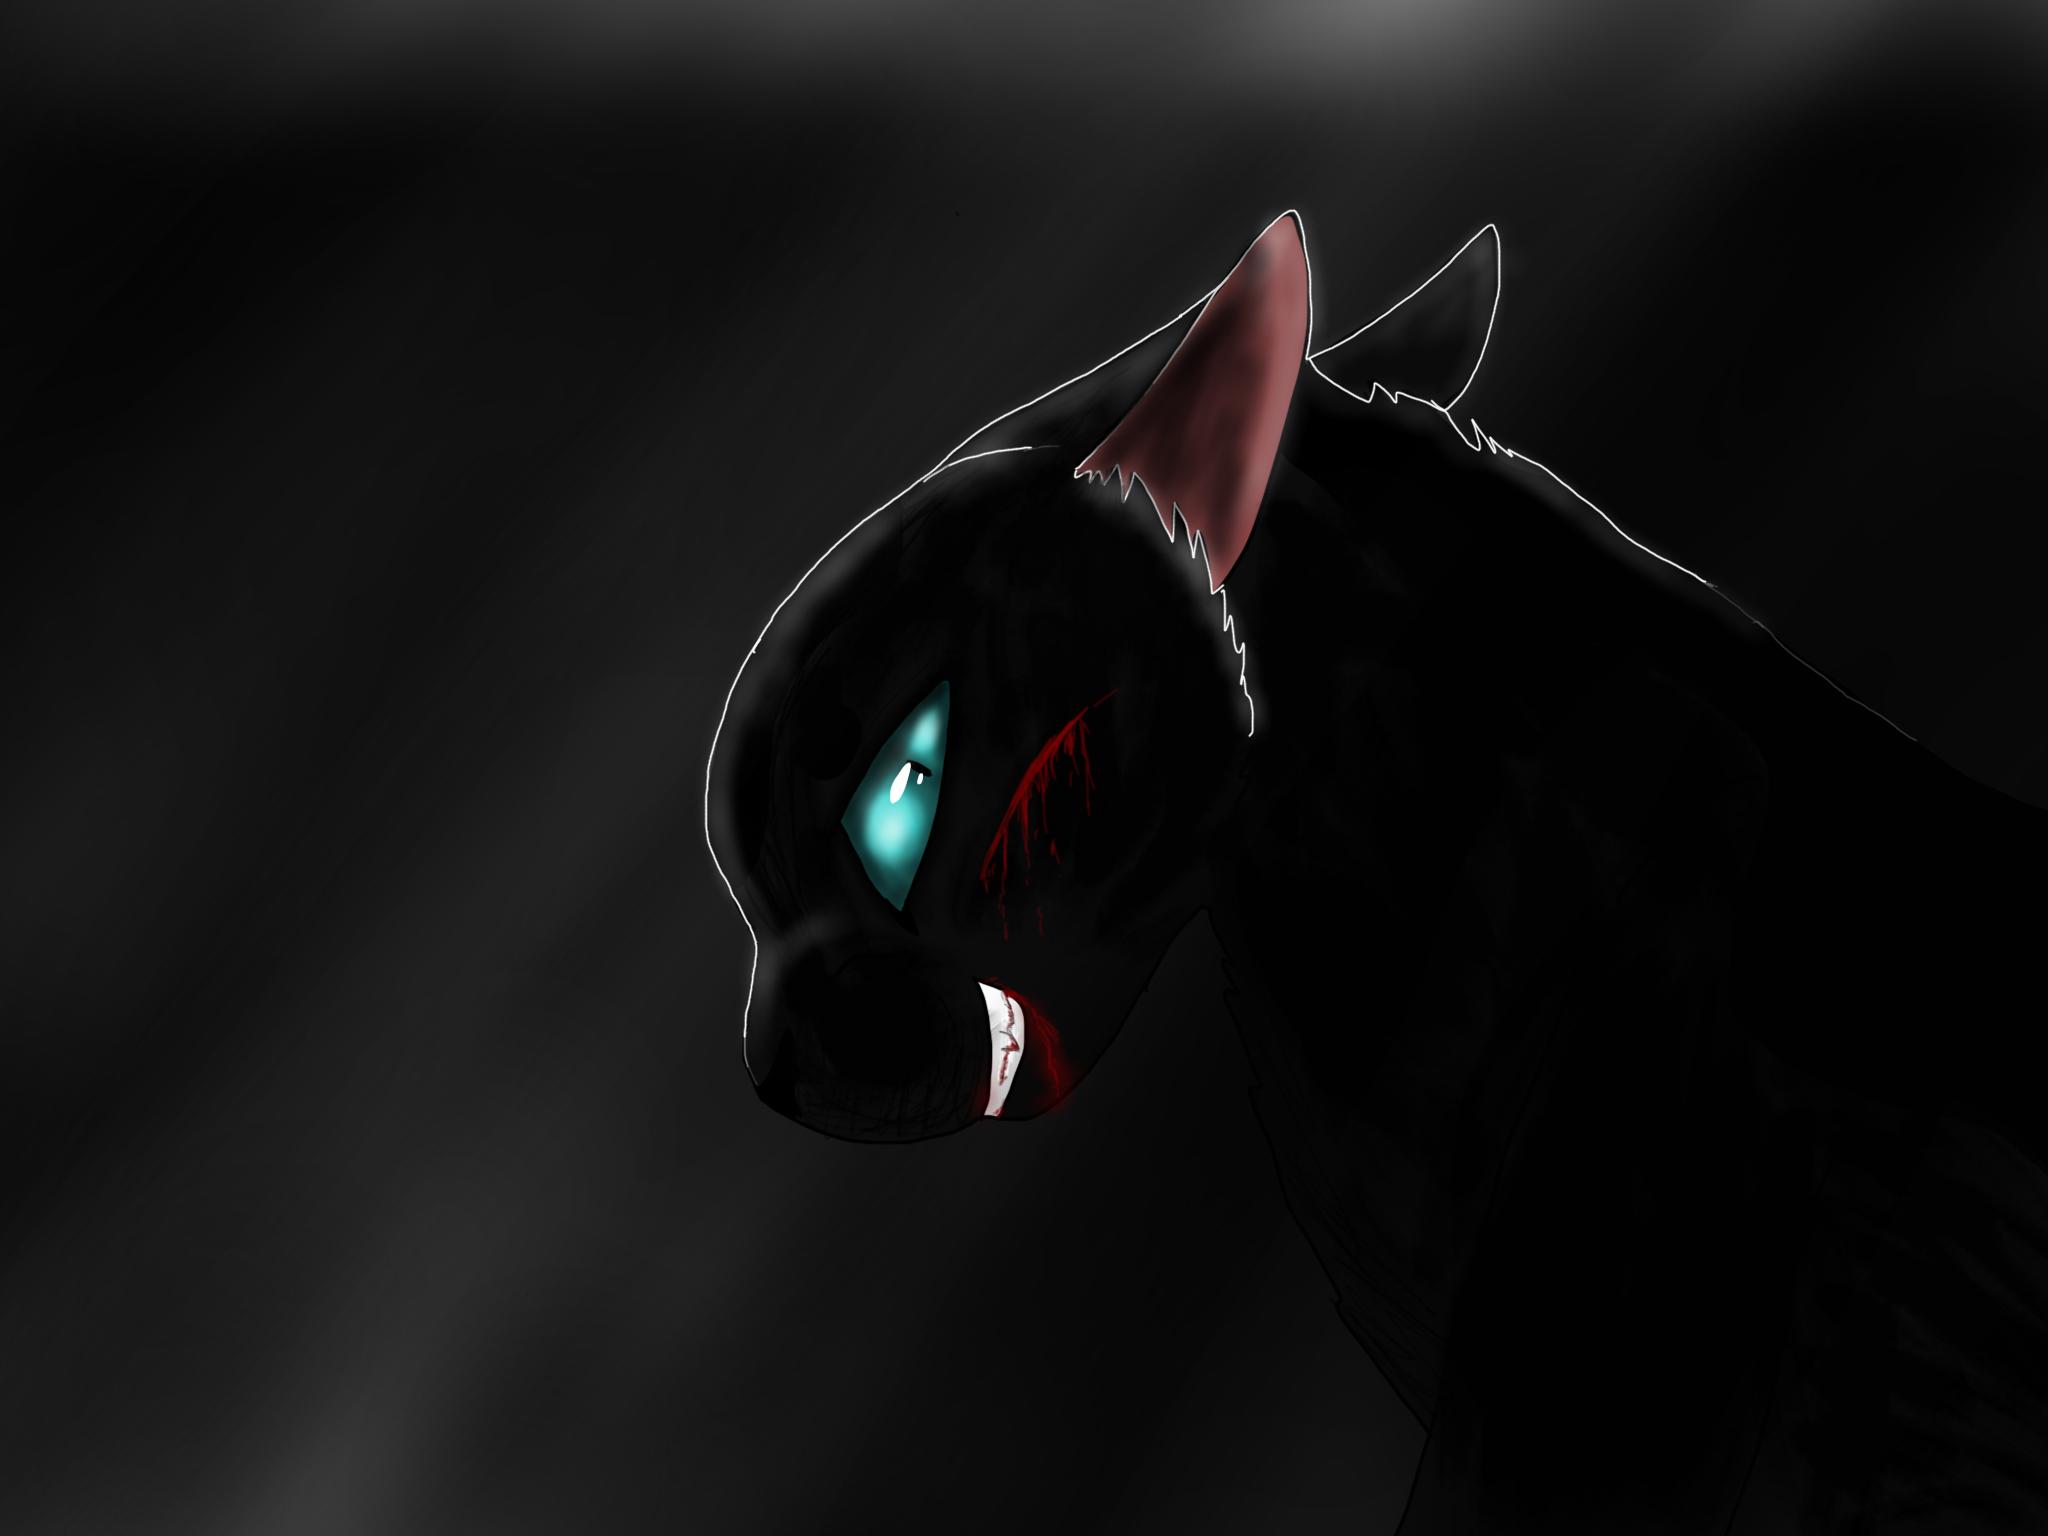 {Request} Batcloak WaCa character by Leafstormy